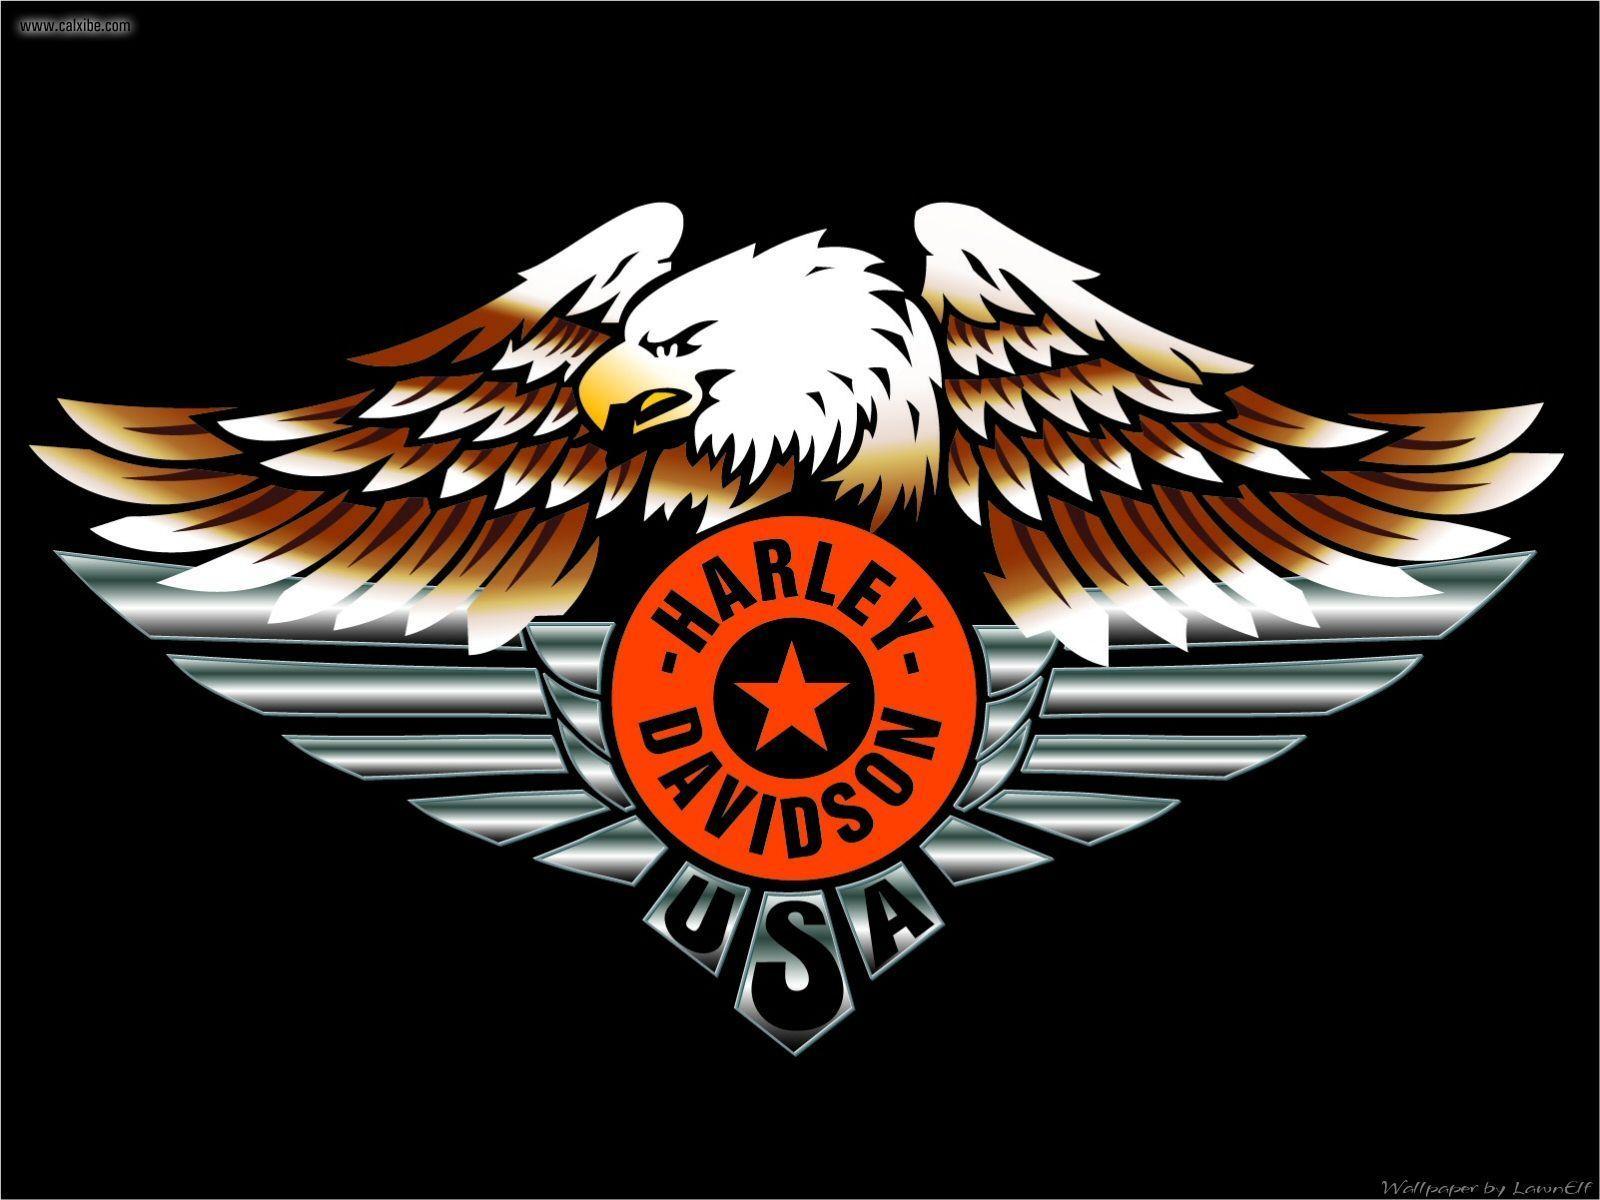 Harley Davidson Eagle Wallpaper 7500 Hd Wallpapers in Bikes   Imagesci 1600x1200